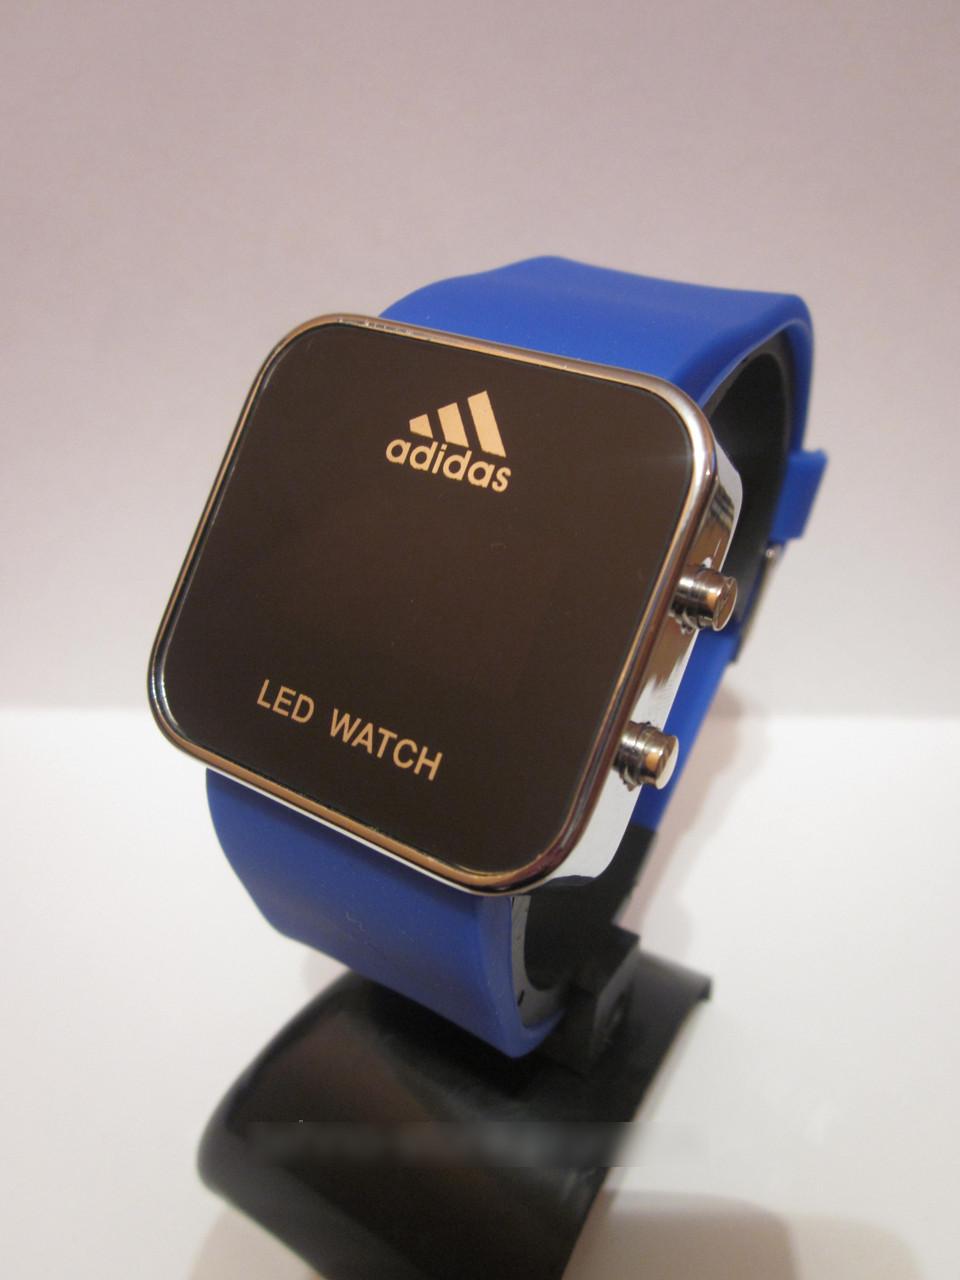 Часы наручные Adidas Led Watch, наручные часы Адидас купить луганск